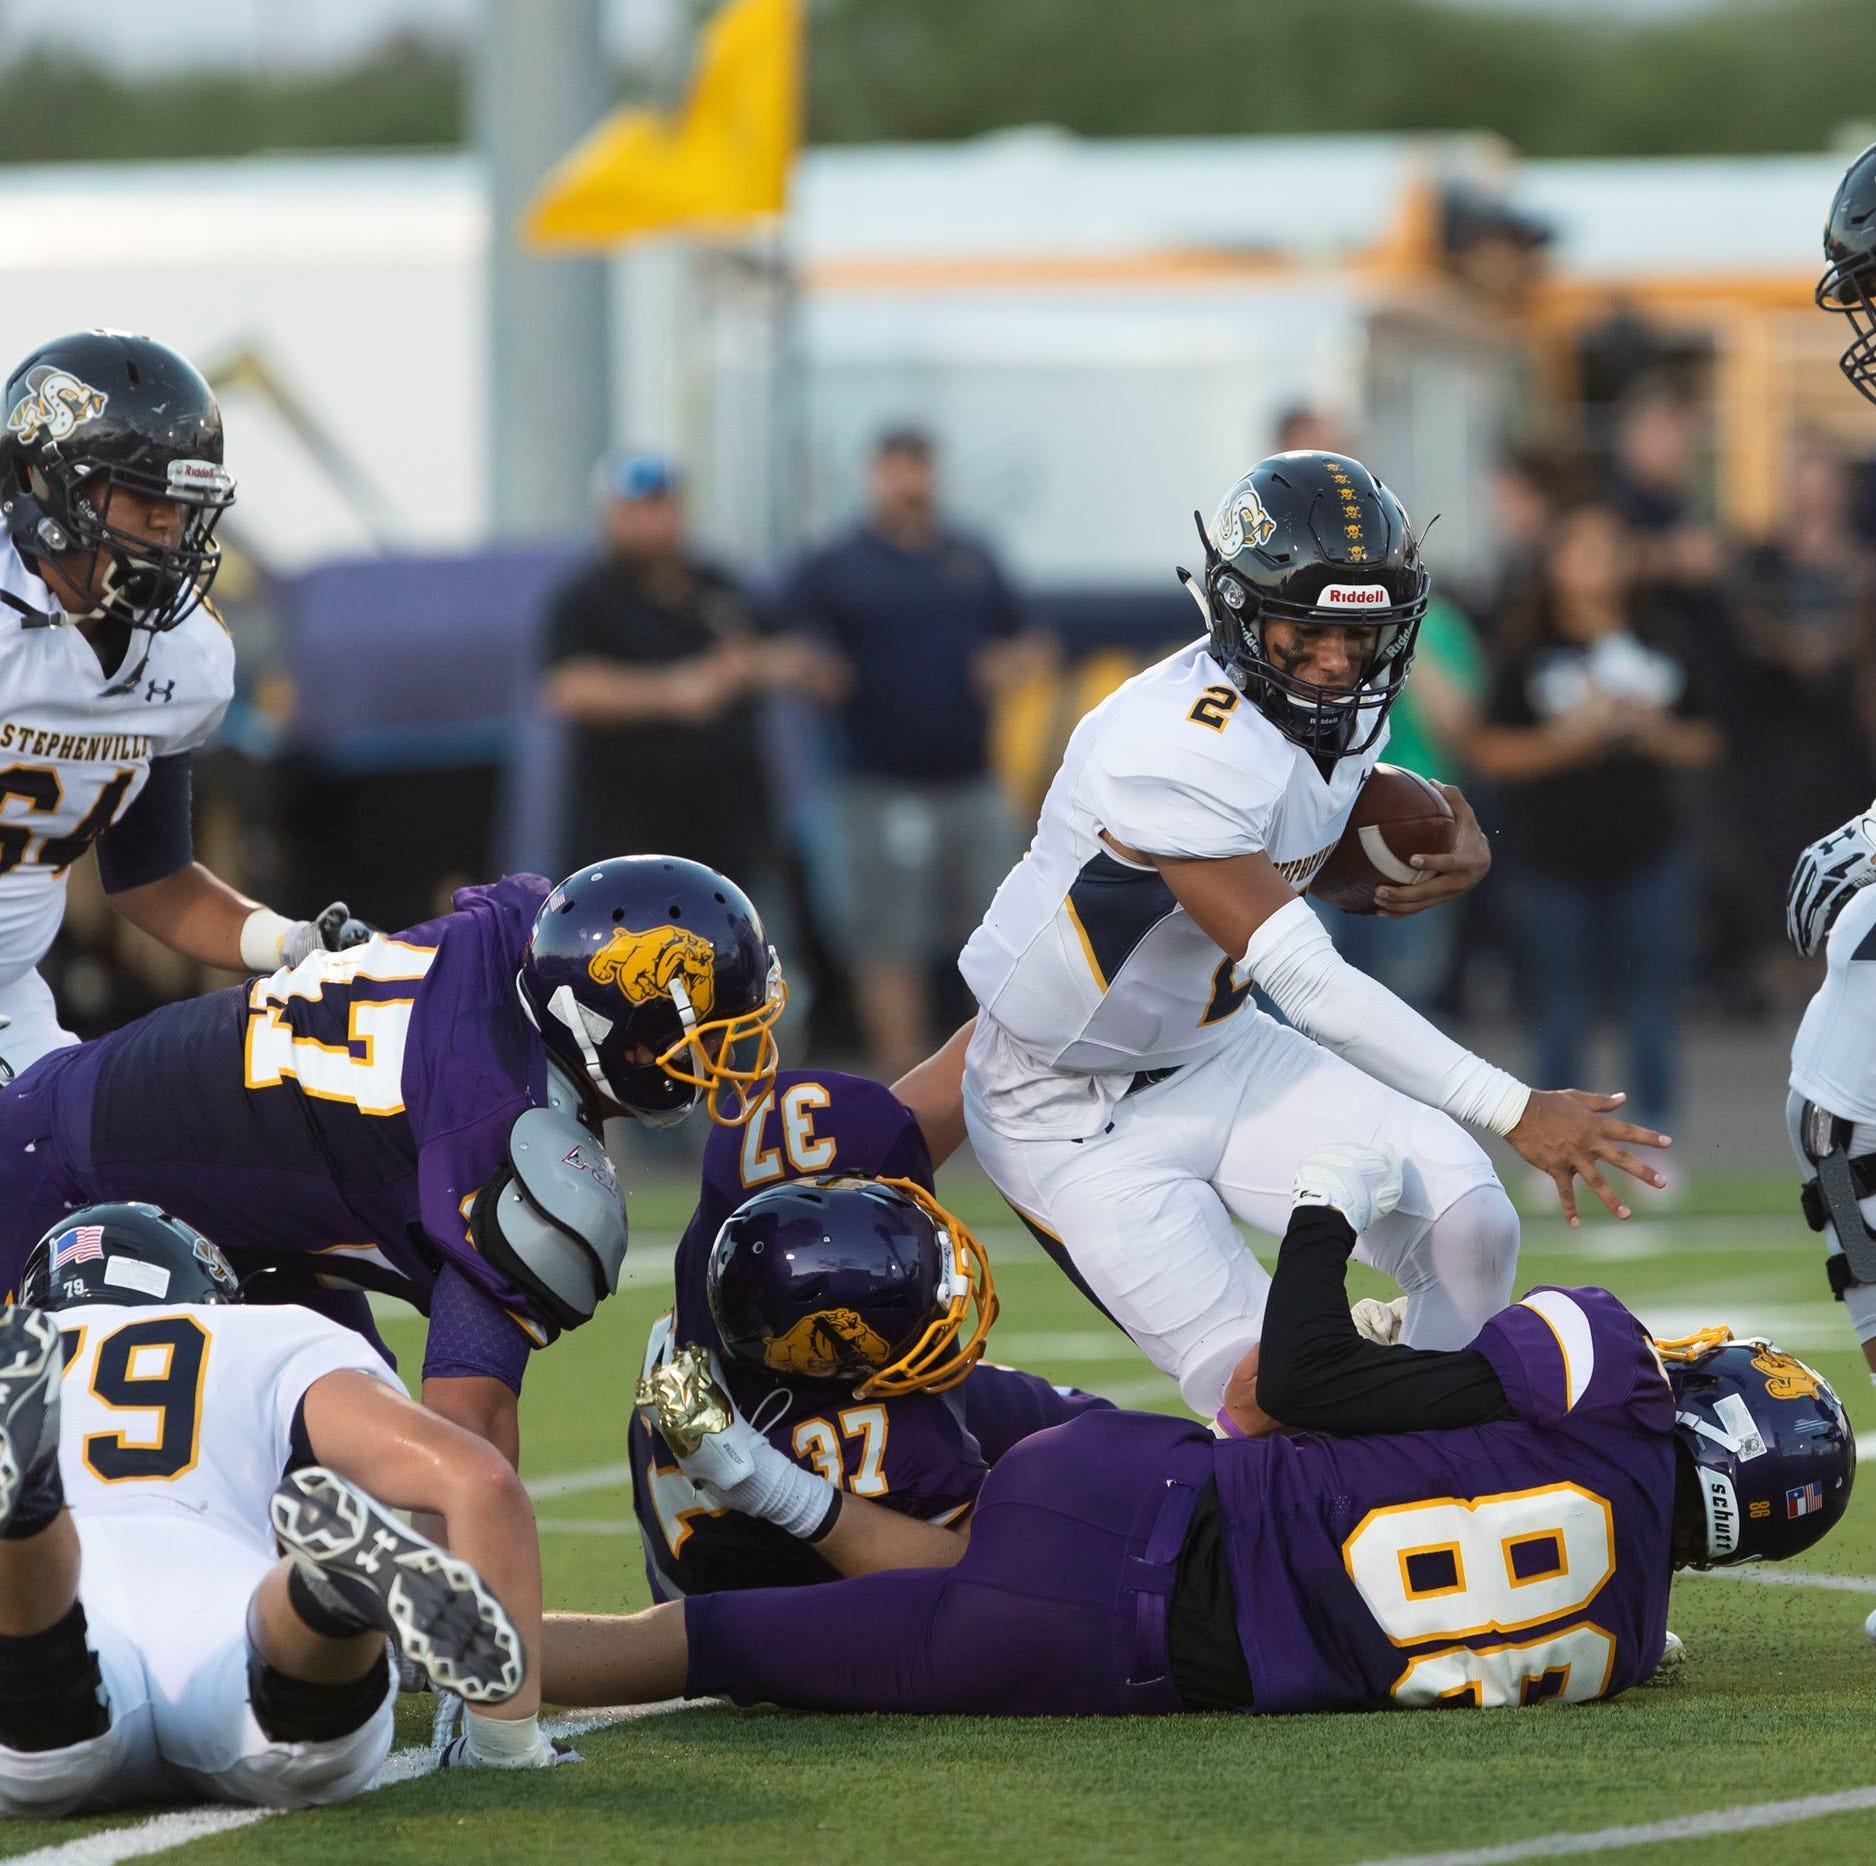 Texas High School Football Scores Sept. 13-15